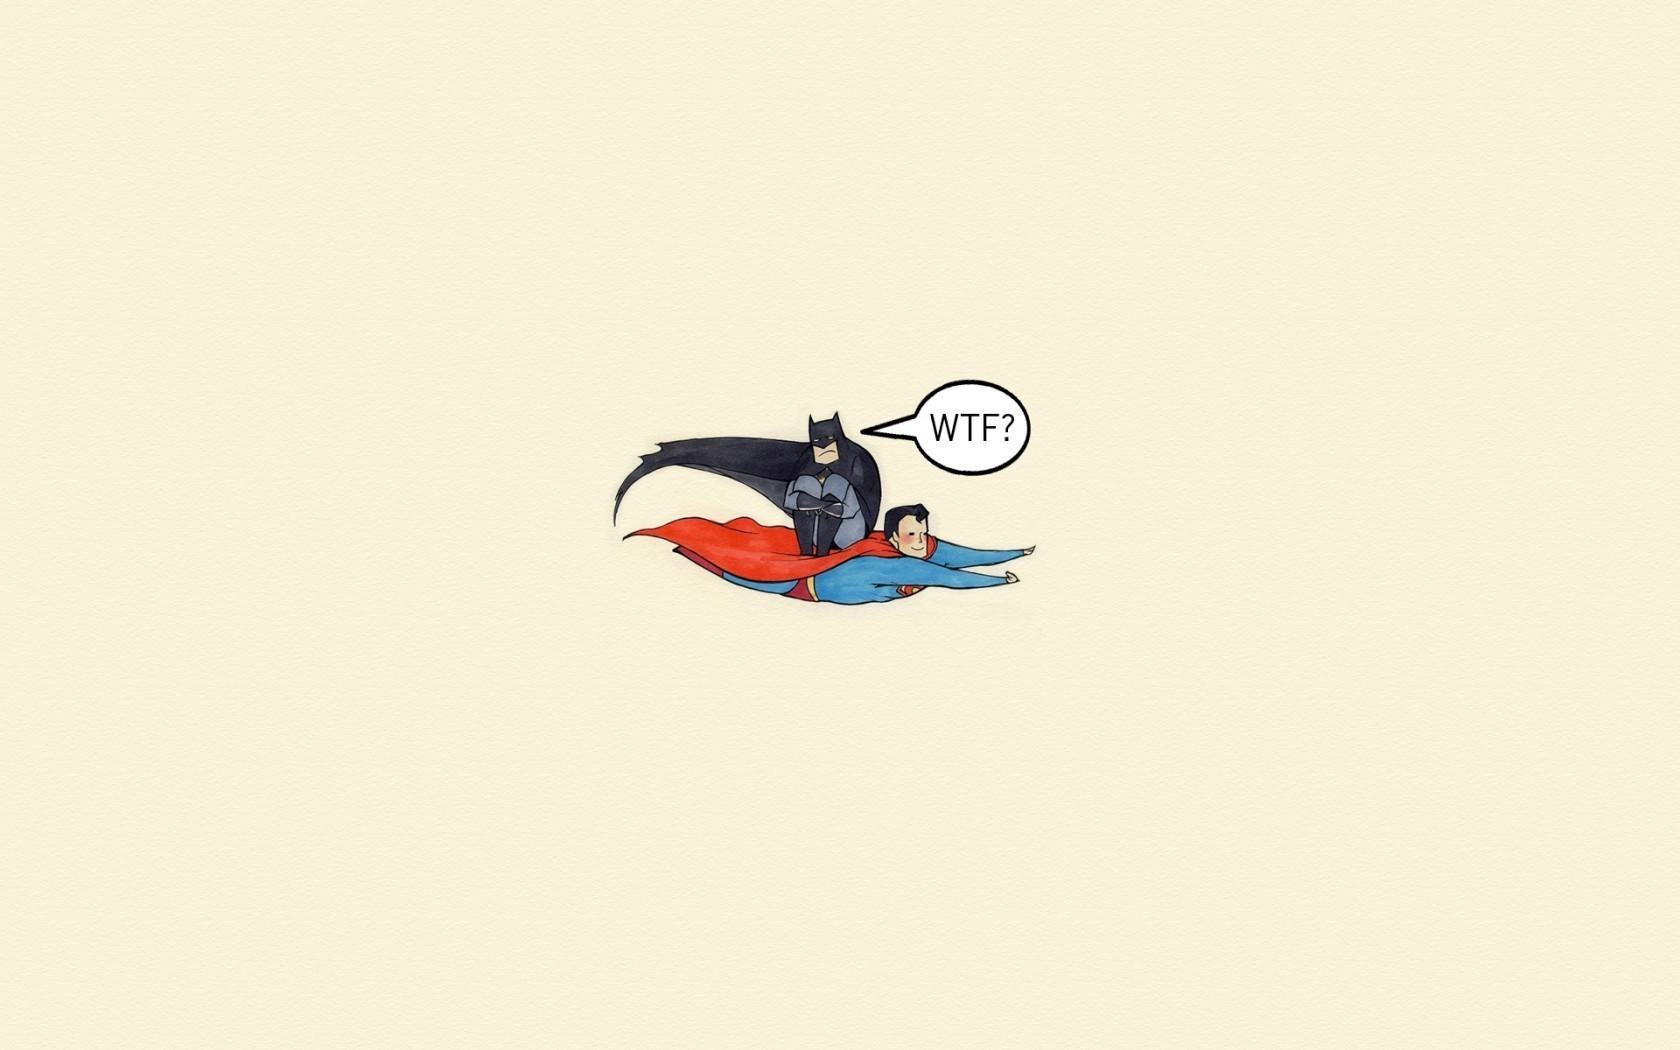 General 1680x1050 minimalism artwork superhero cartoon Batman Superman simple background humor flying cape